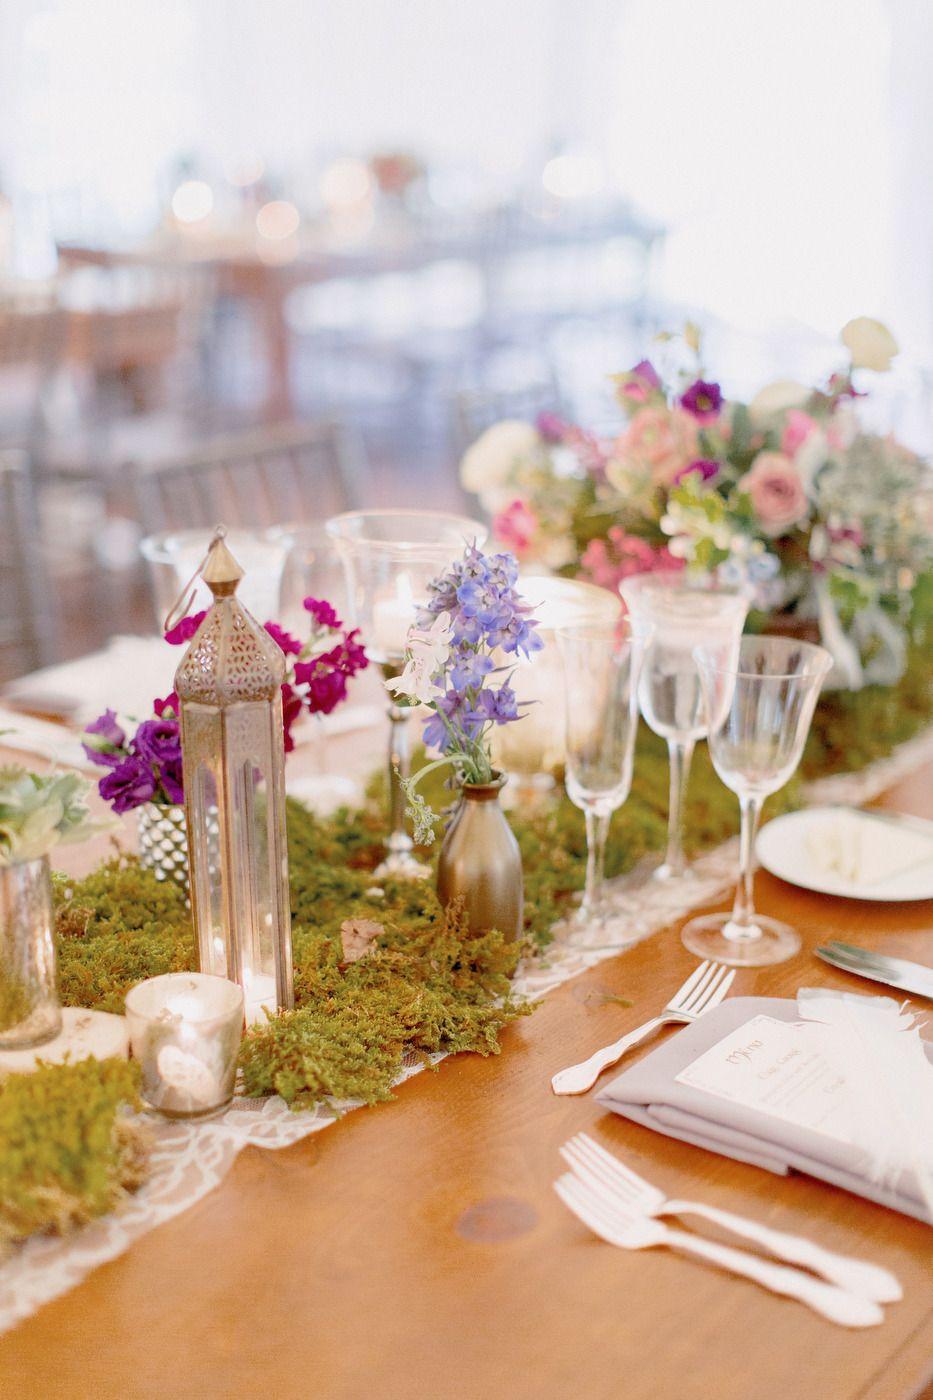 Decoración de mesa con musgo